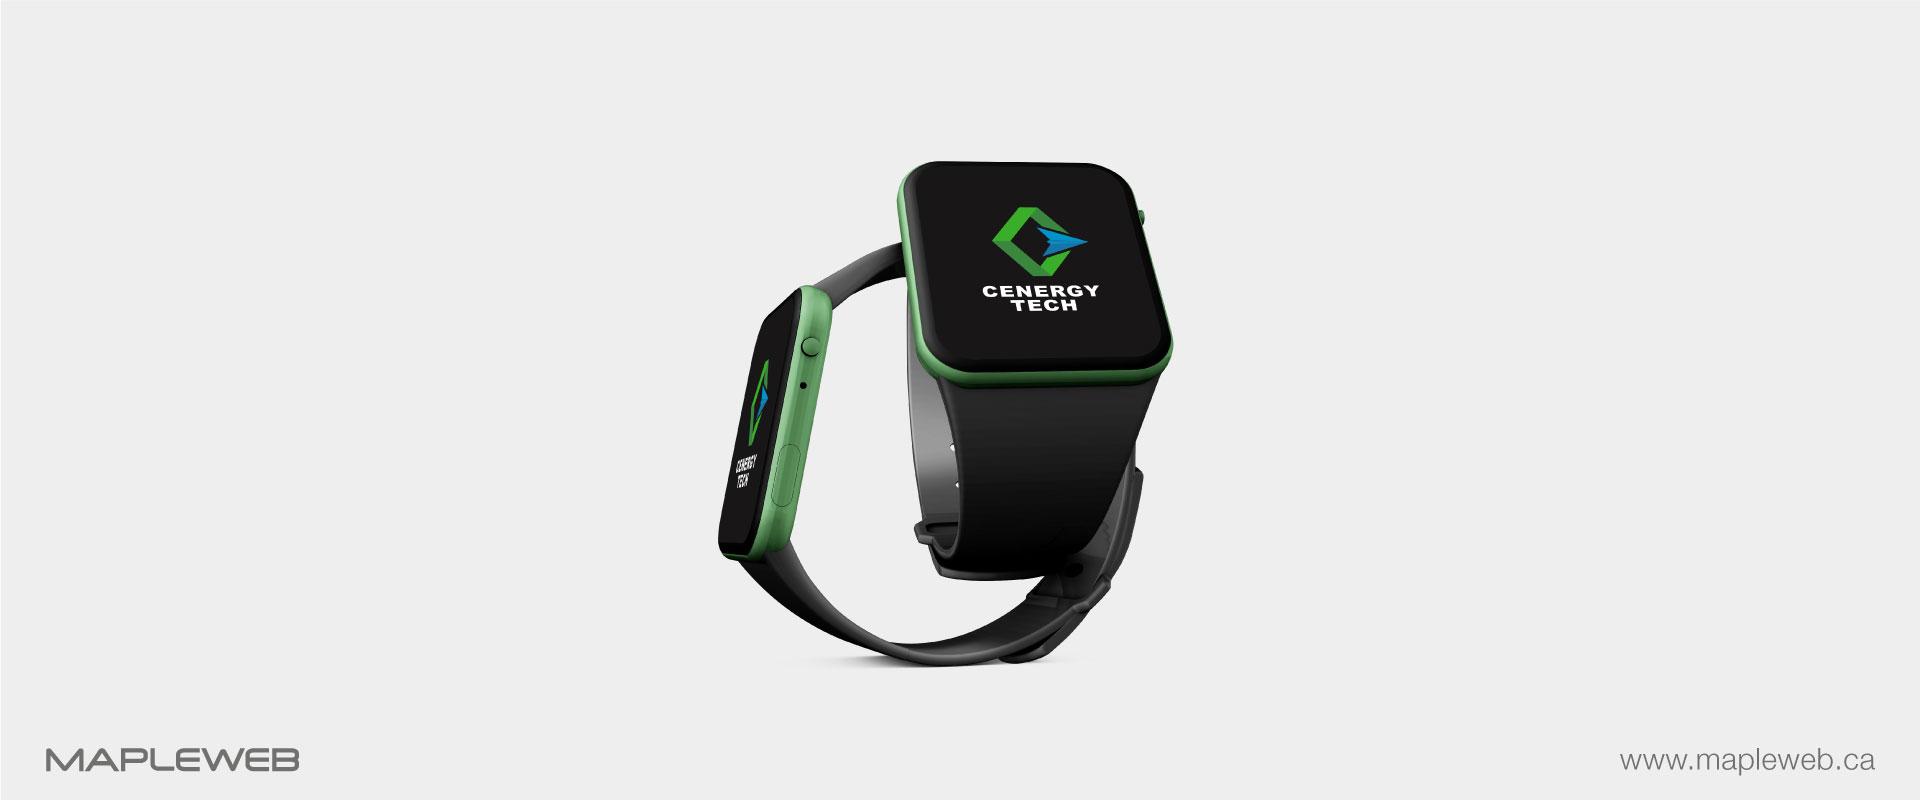 cenergy-tech-brand-logo-design-by-mapleweb-vancouver-canada-watch-mock